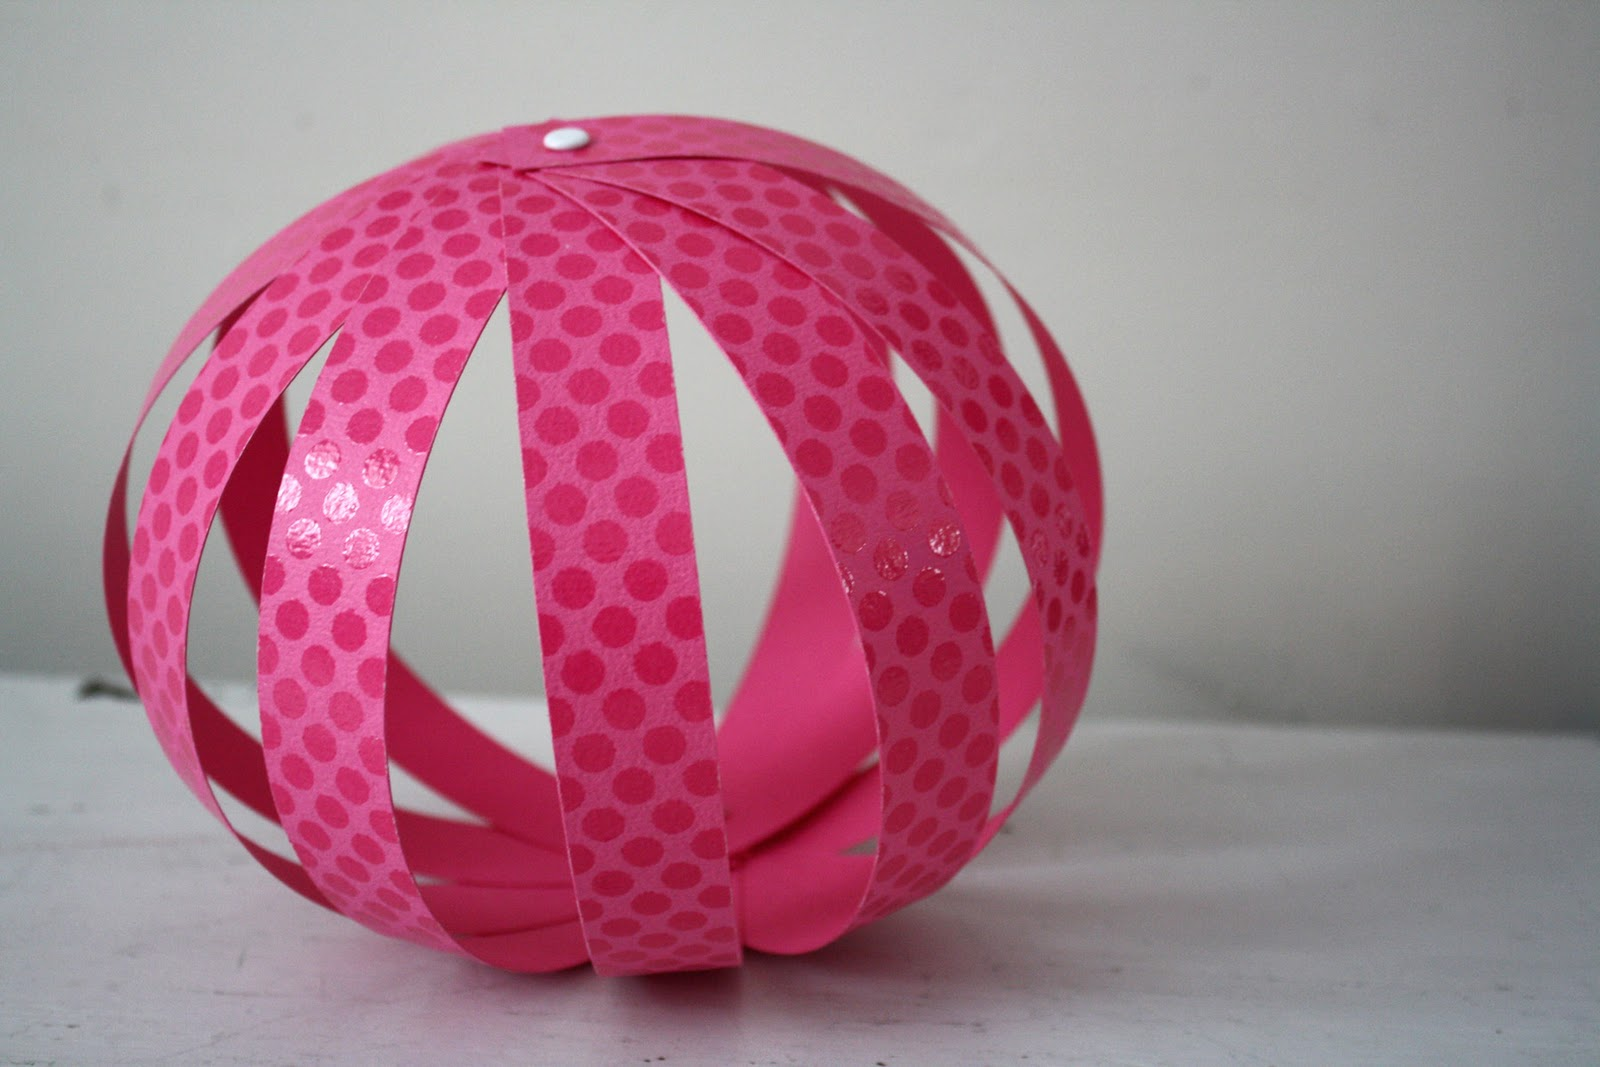 http://2.bp.blogspot.com/_cqiudyMXGww/TUM9wA0rS6I/AAAAAAAACQw/MLhCeDnQoAs/s1600/Party+Paper+Sphere.jpg